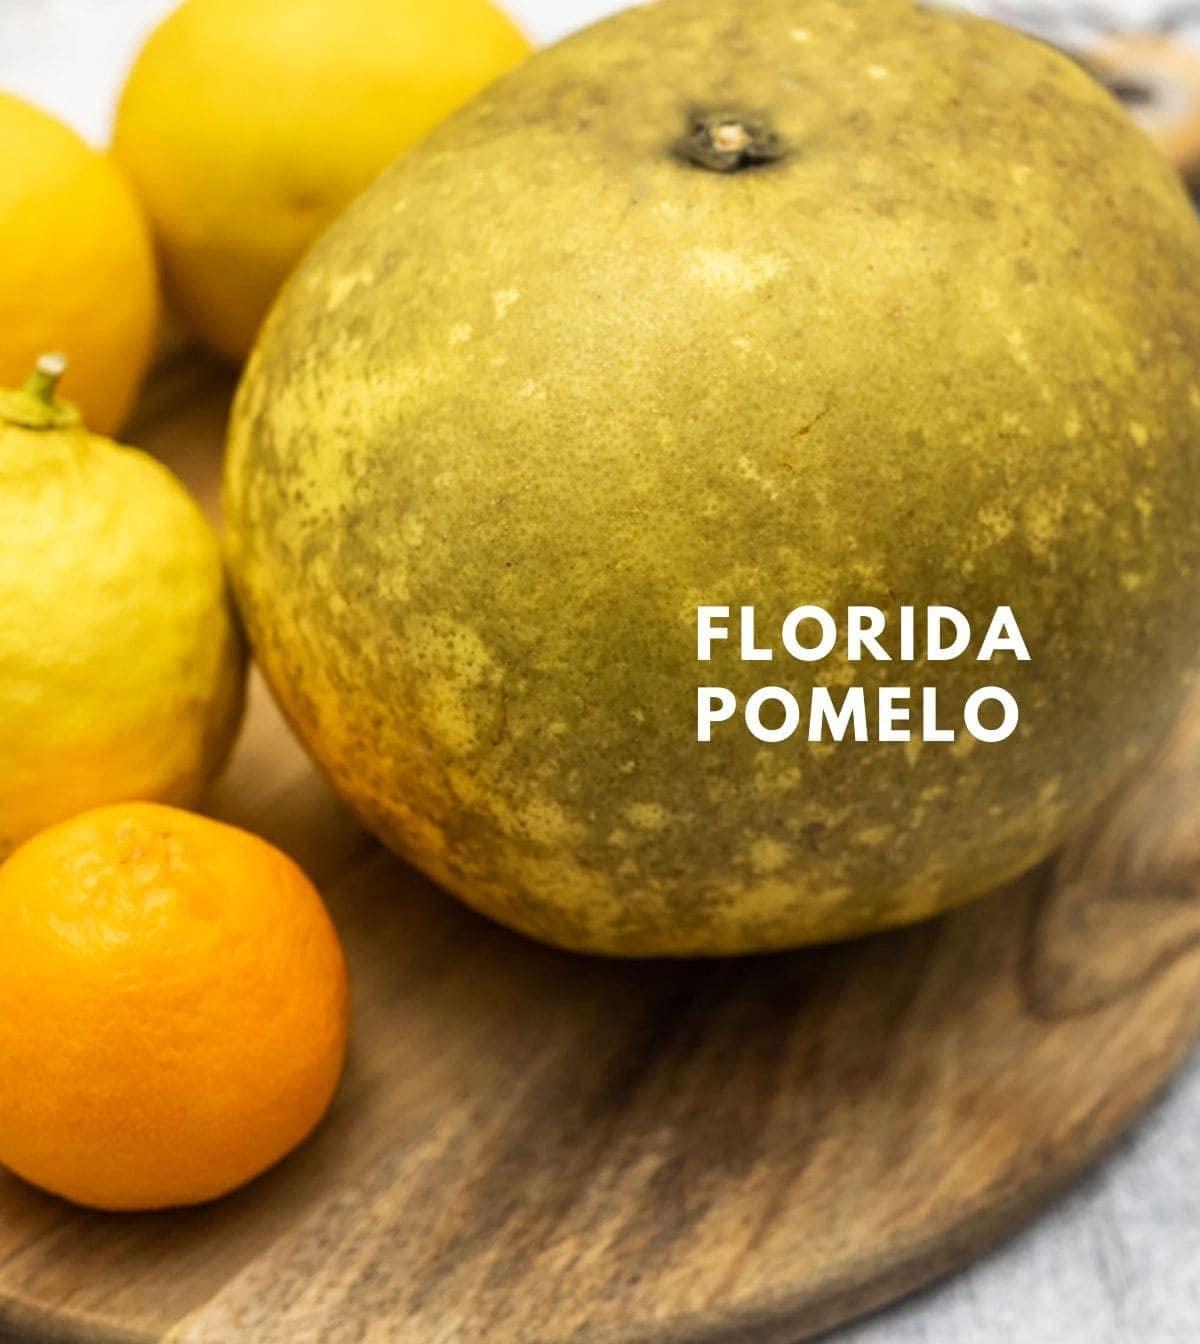 Florida pomelo fruit with lemons